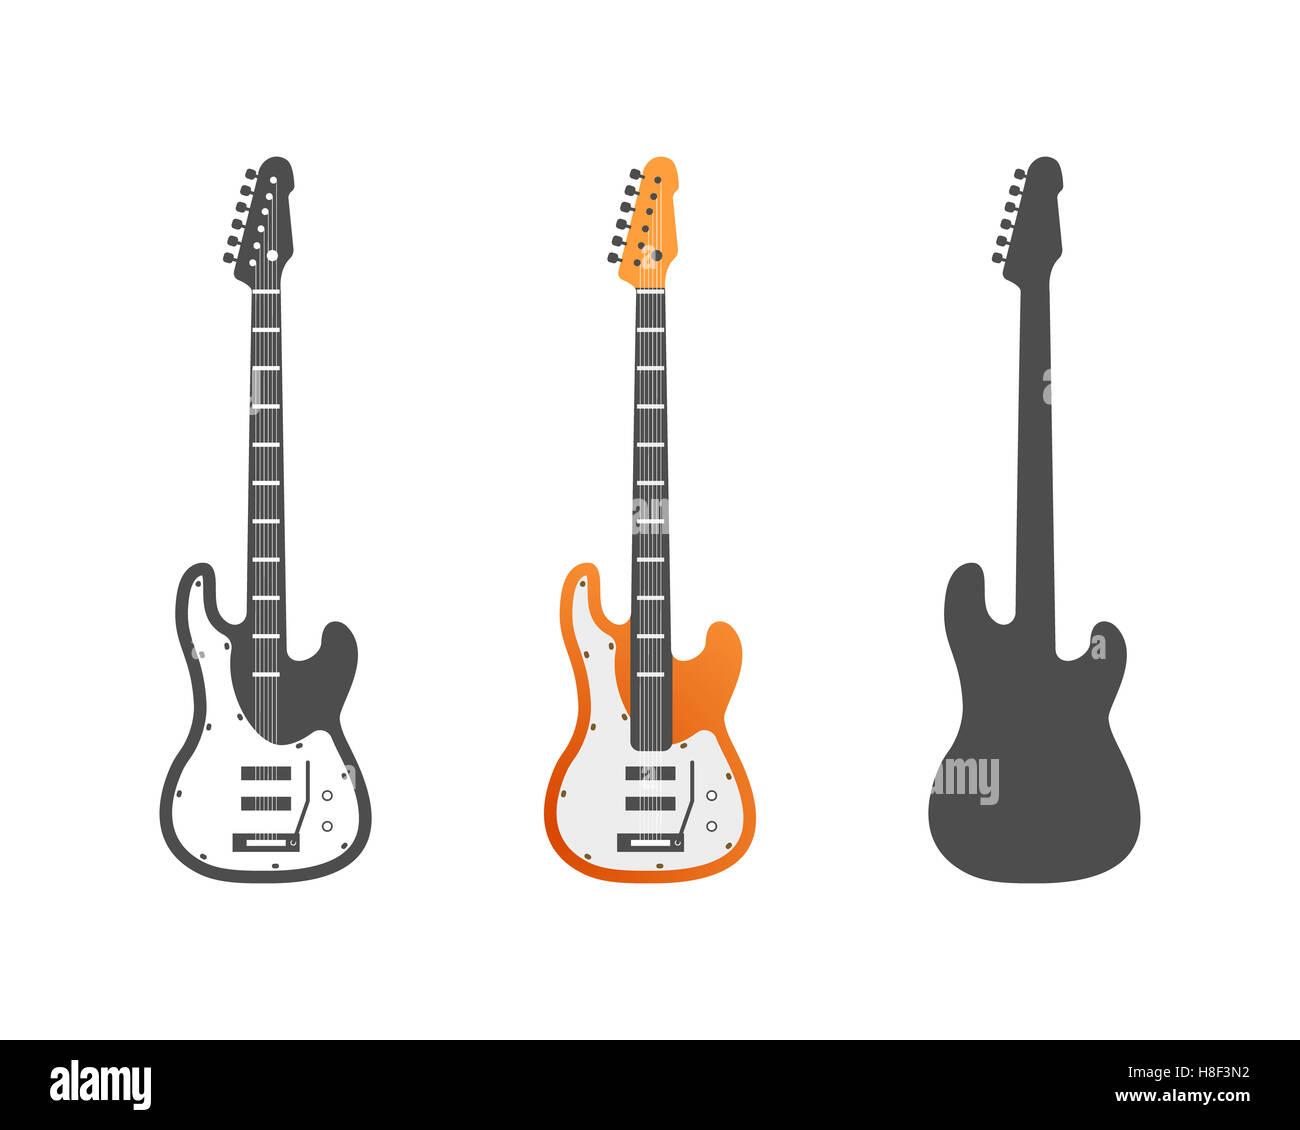 Electric Guitars Icons Set Musical Instrument Symbols Illustration